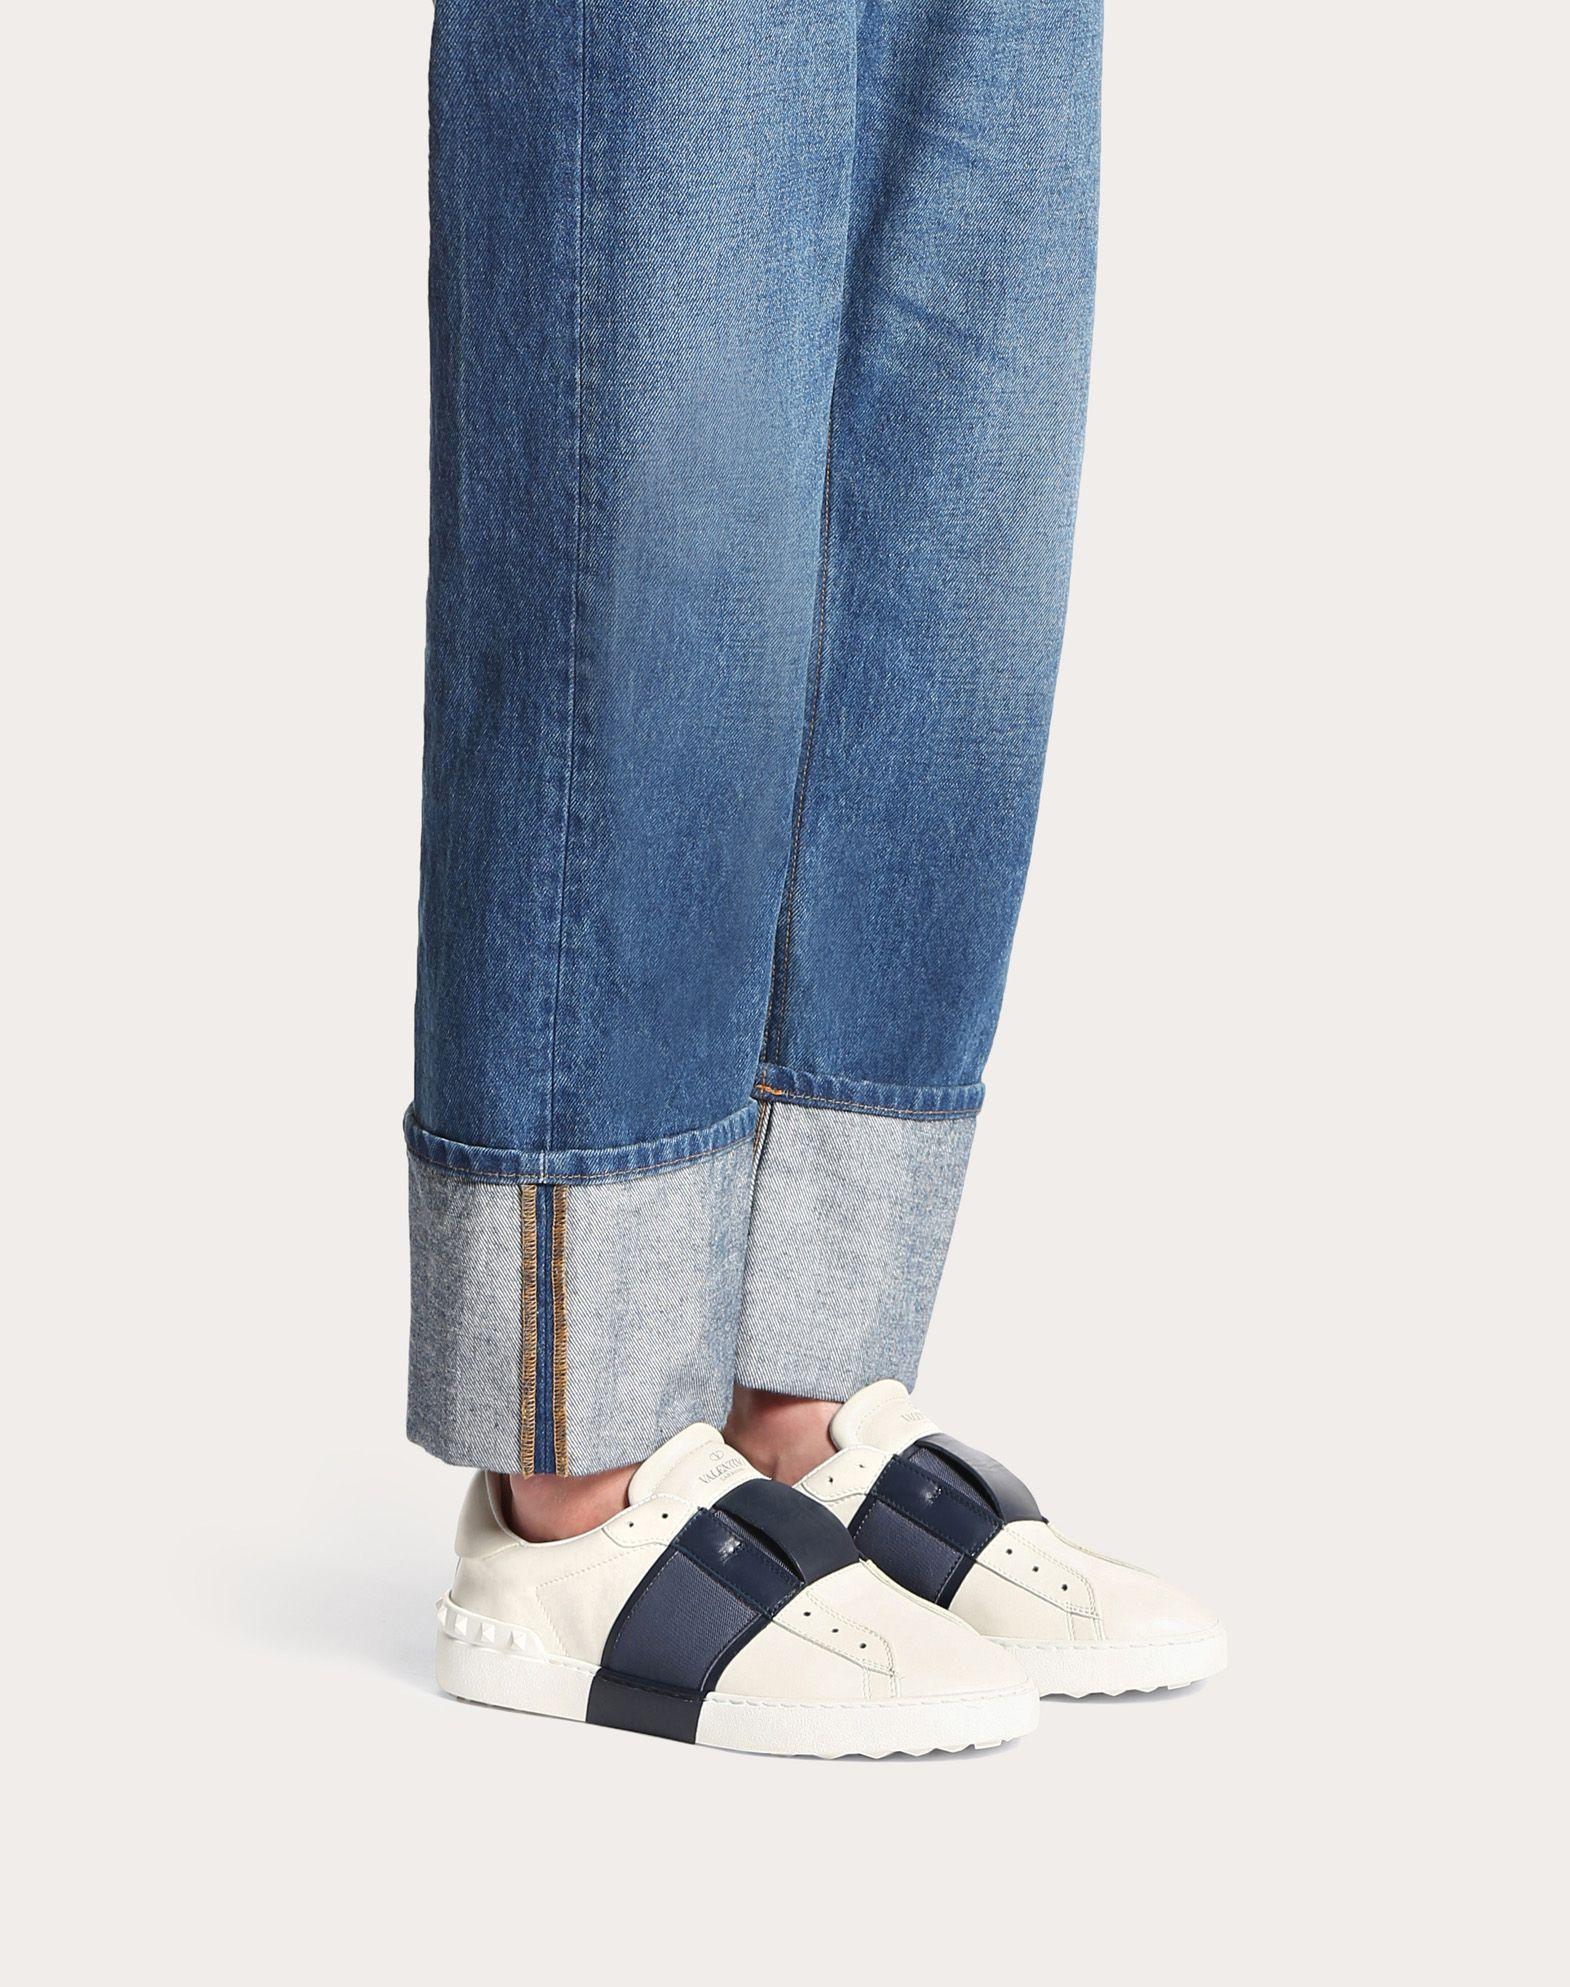 VALENTINO GARAVANI UOMO Elastic Sneaker LOW-TOP SNEAKERS U a